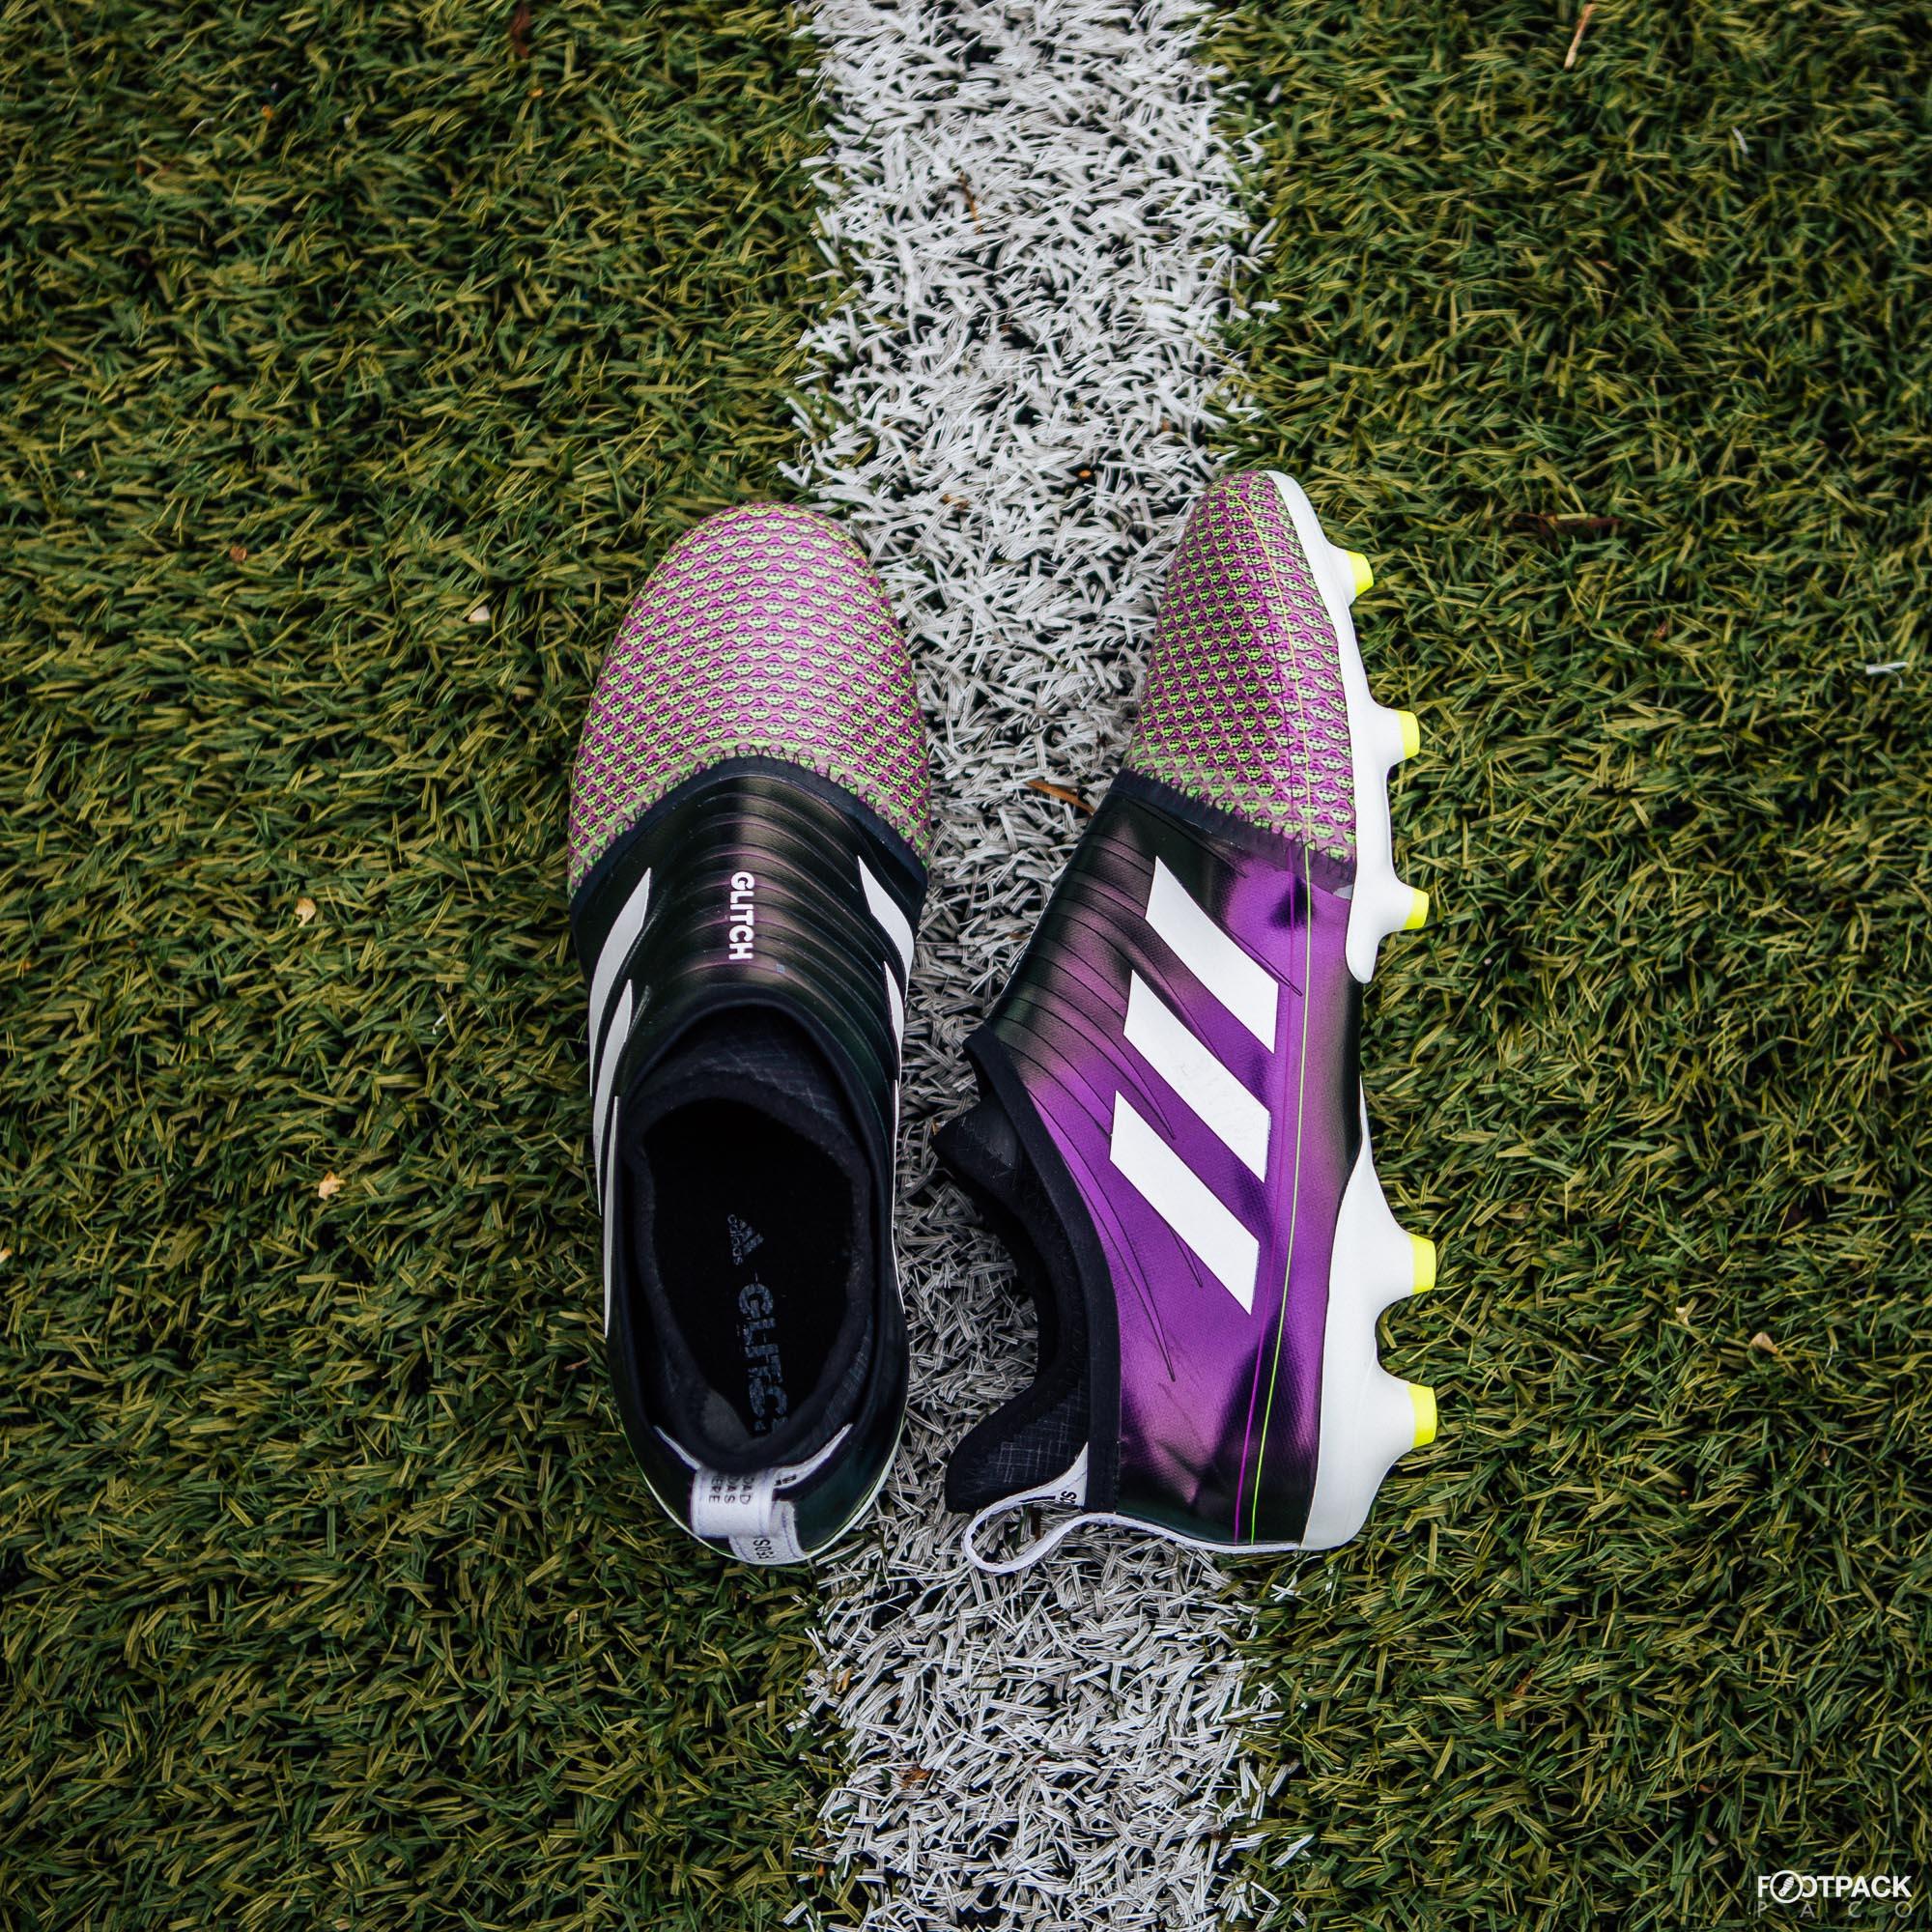 Chaussures-football-adidas-glitch-f50-mai-2018-5